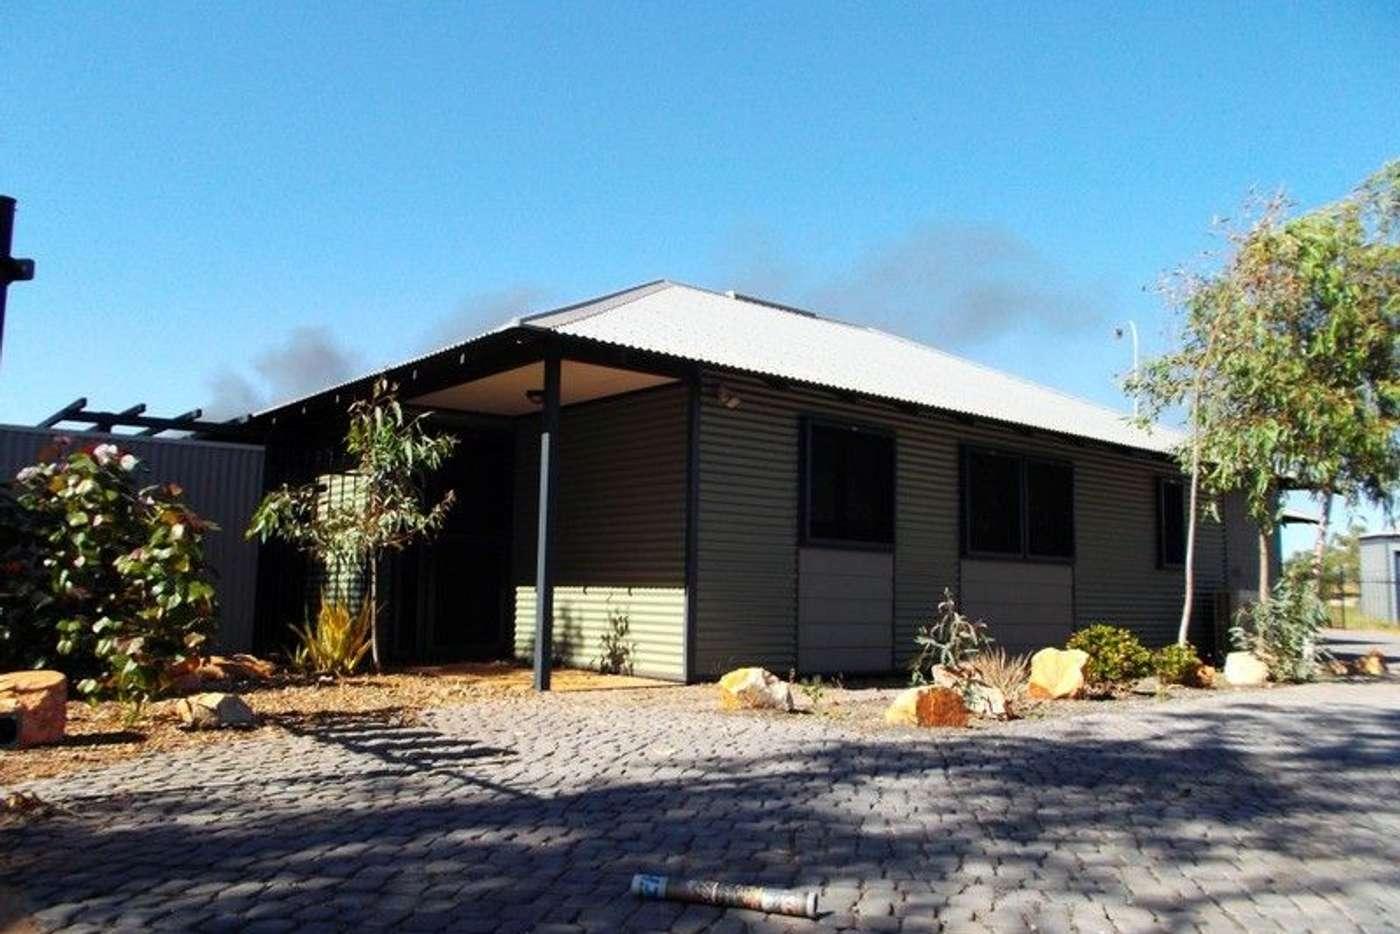 Main view of Homely house listing, 2/2 Phalarope Way, South Hedland WA 6722